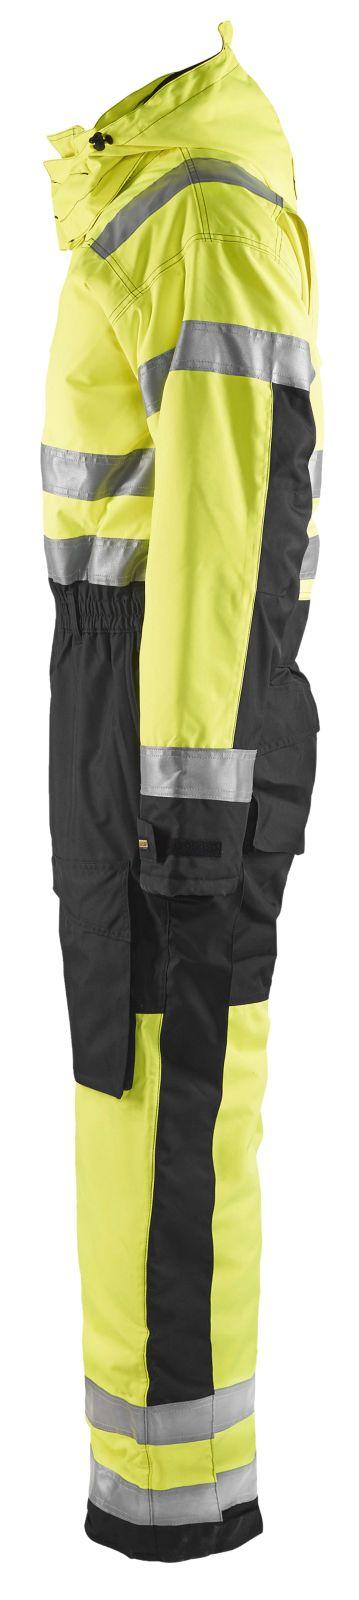 Blaklader Overalls 67631977 High Vis geel-zwart(3399)